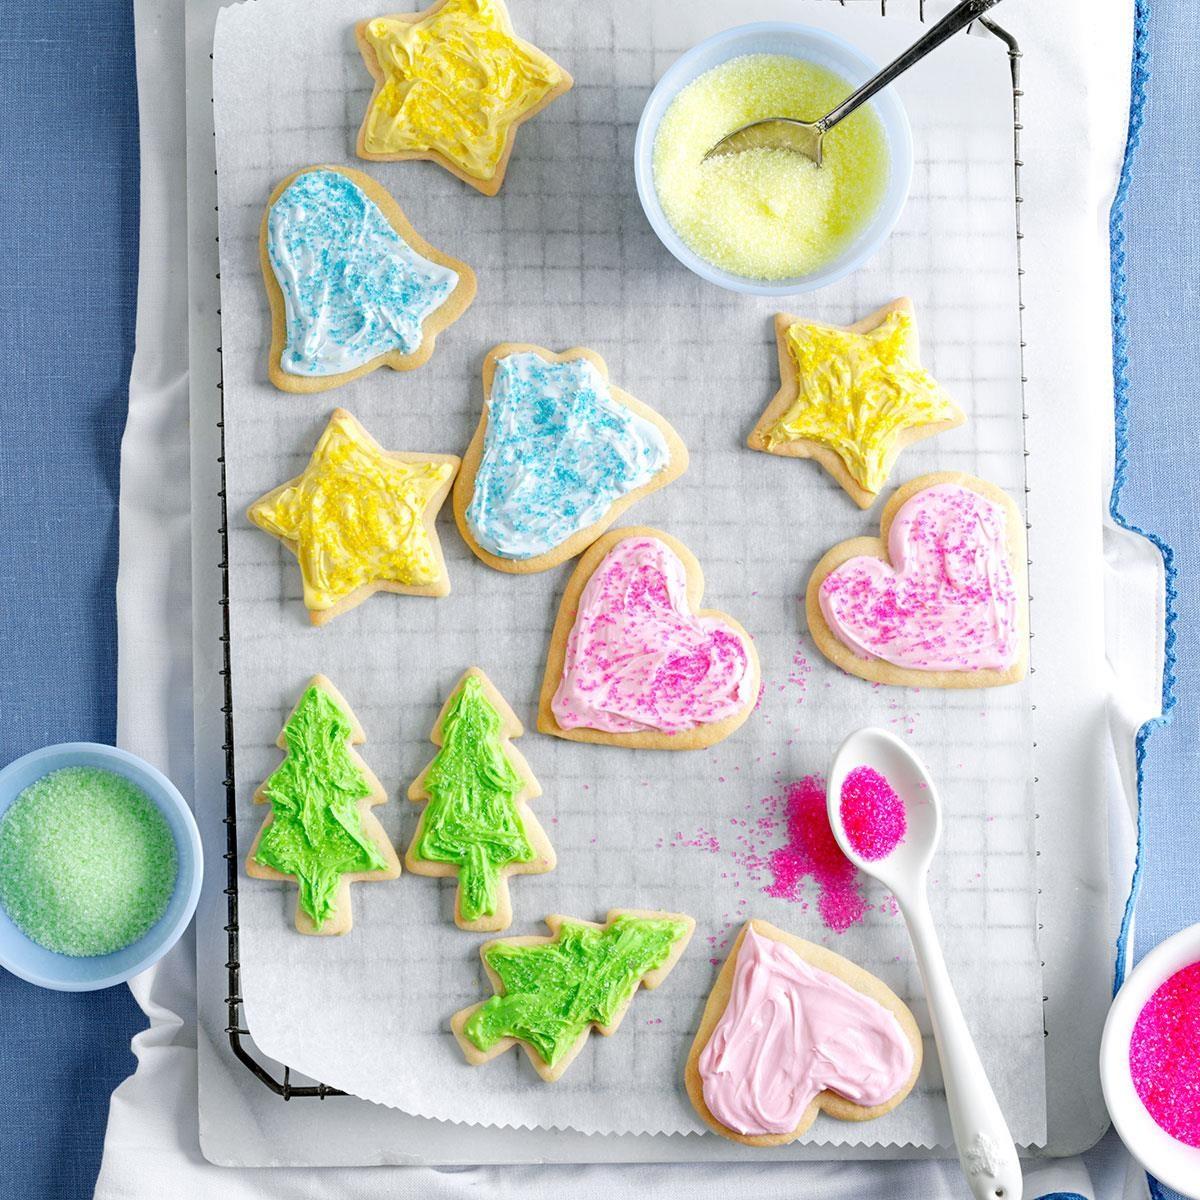 Deluxe Sugar Cookies Recipe